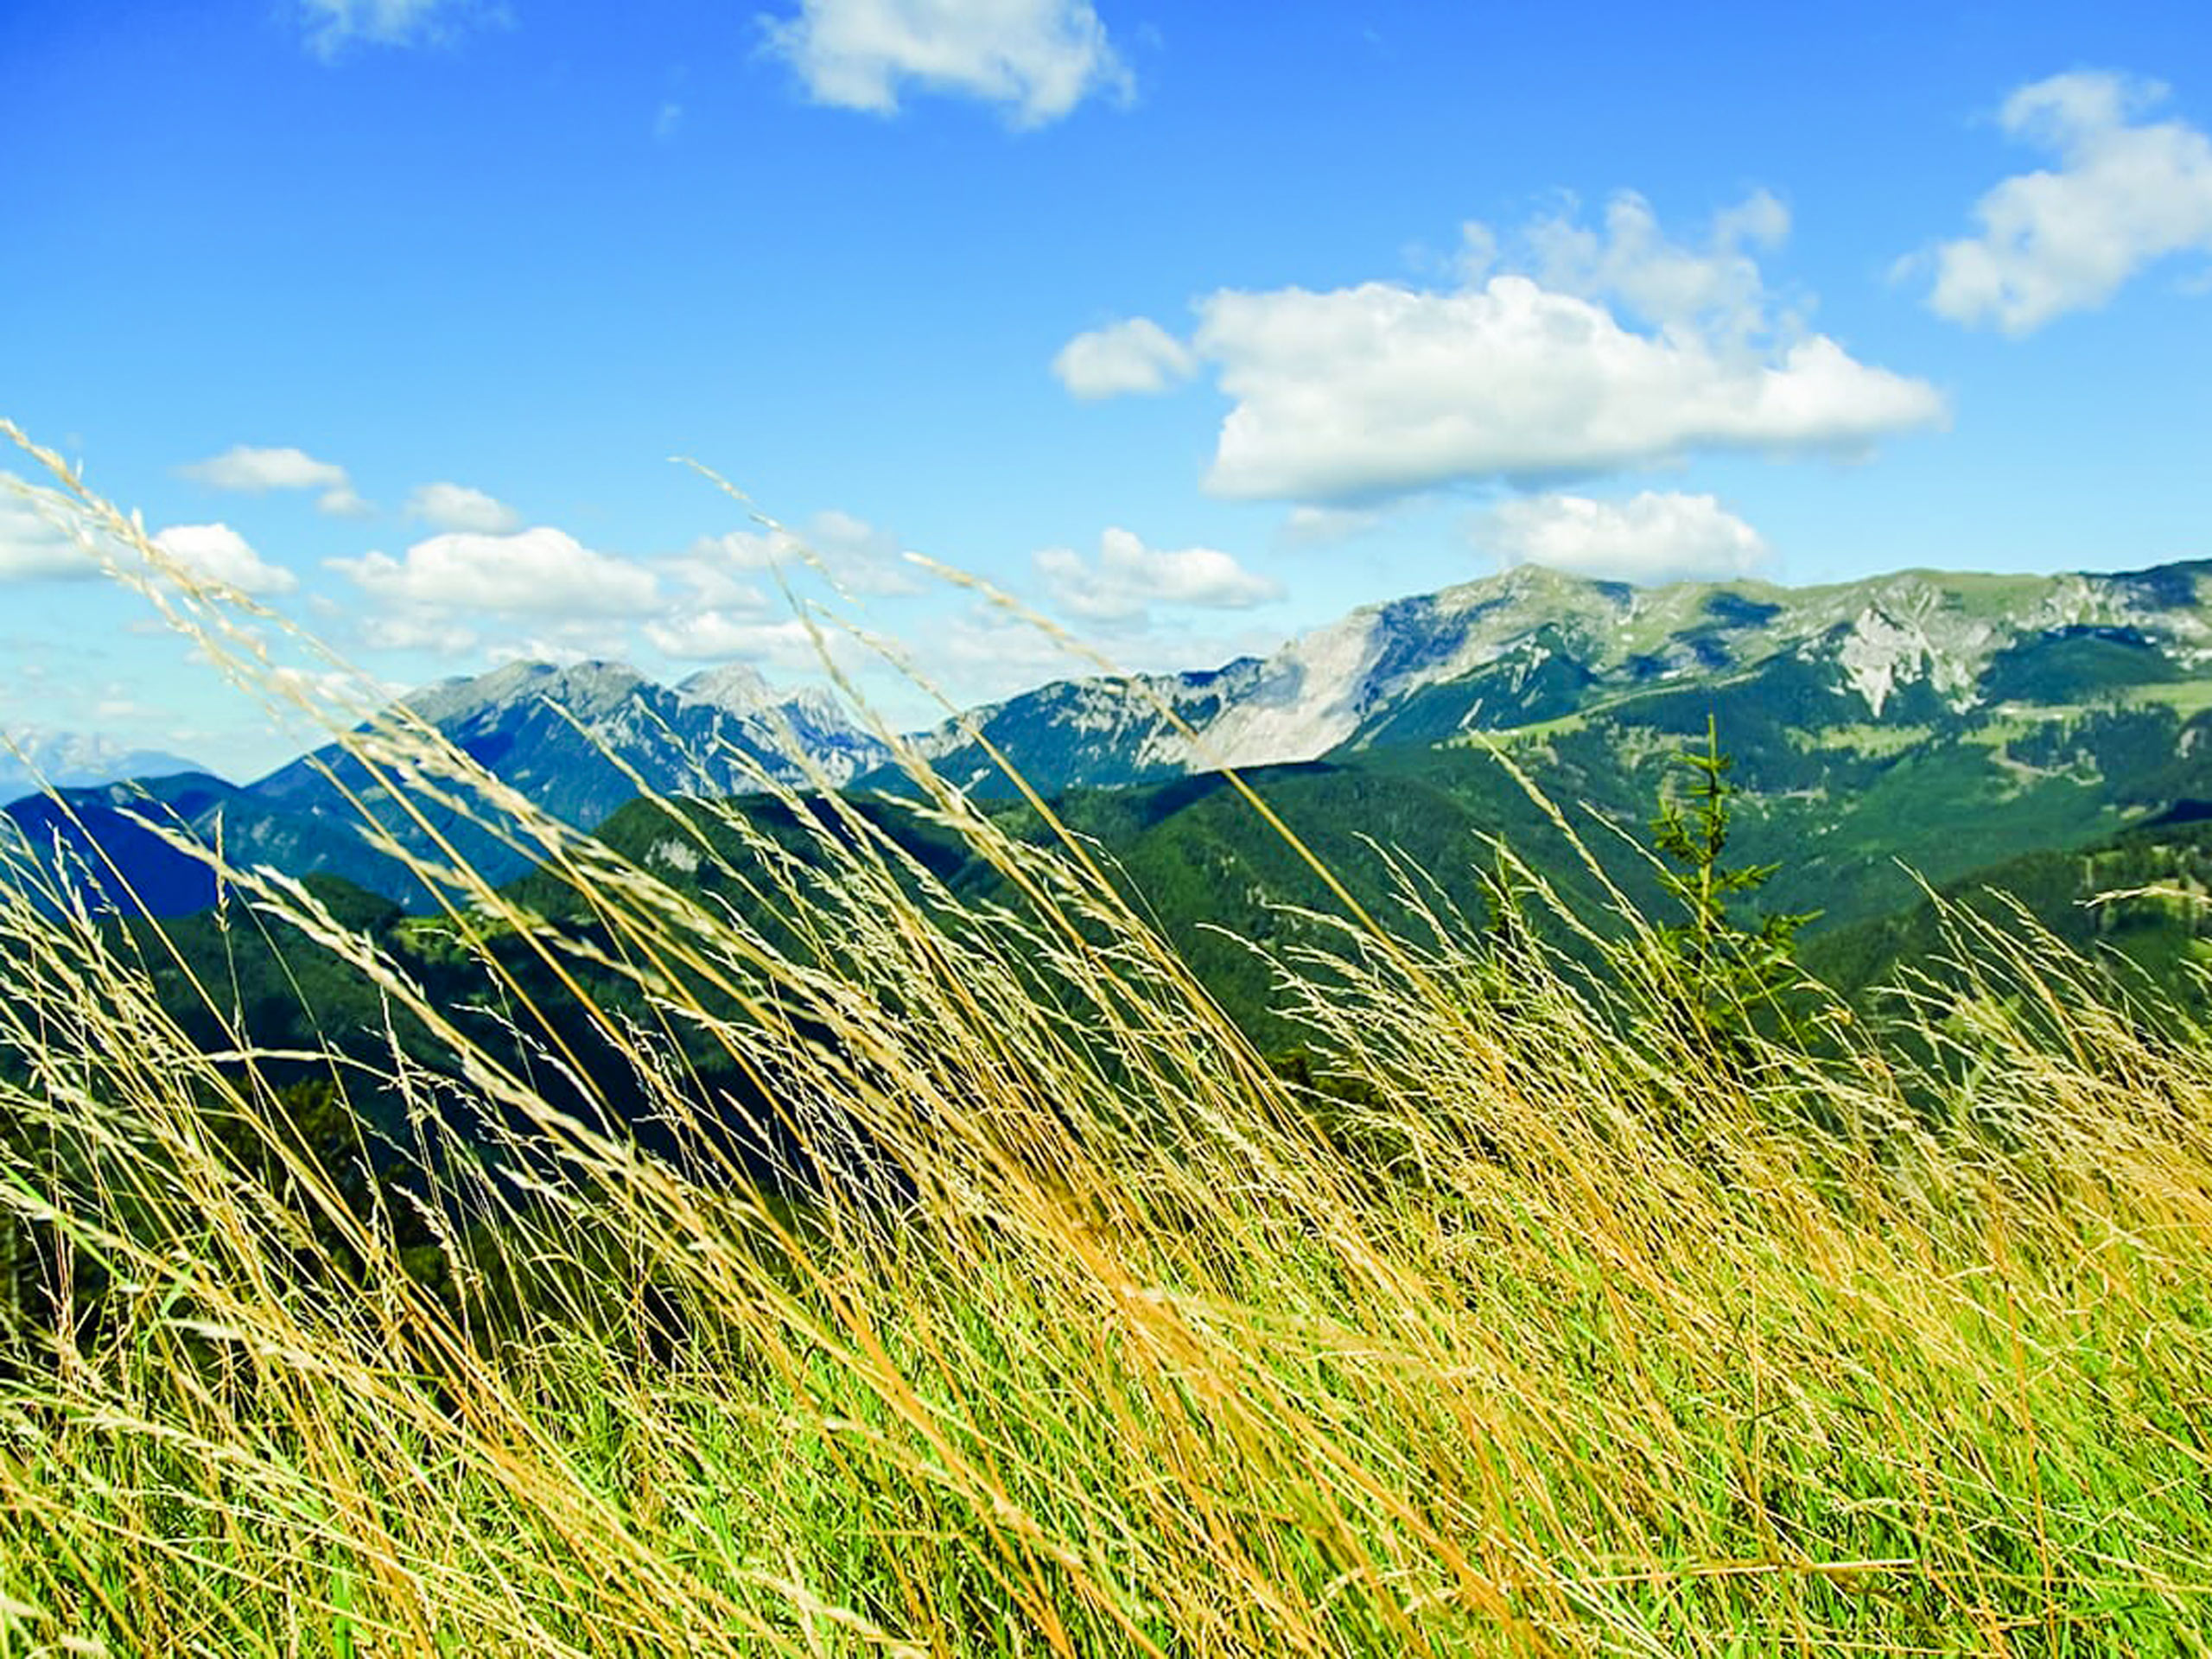 Beautiful view on the mountain range